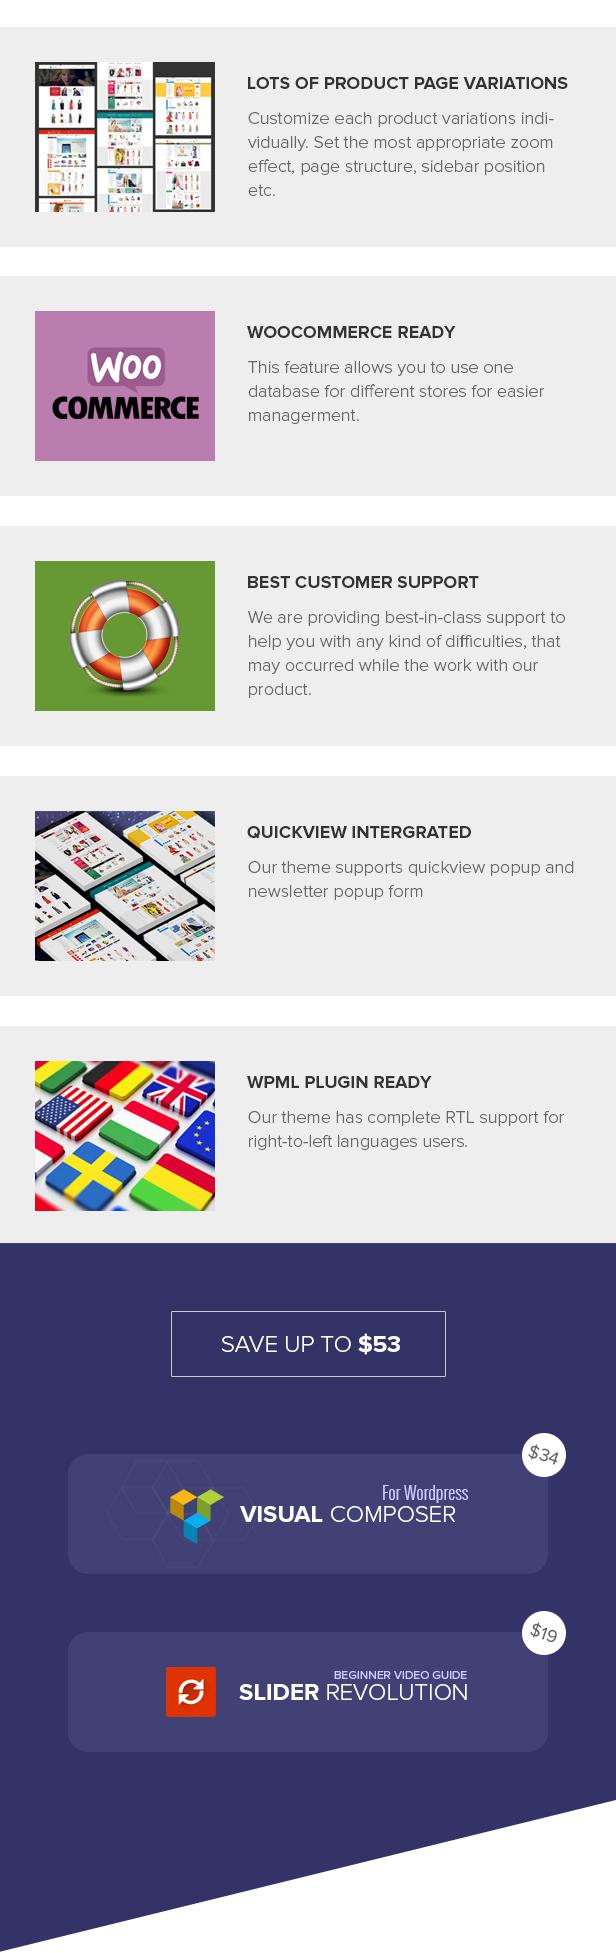 KuteShop - موضوع WooCommerce للموضة والإلكترونيات والسوق (يدعم RTL) - 13